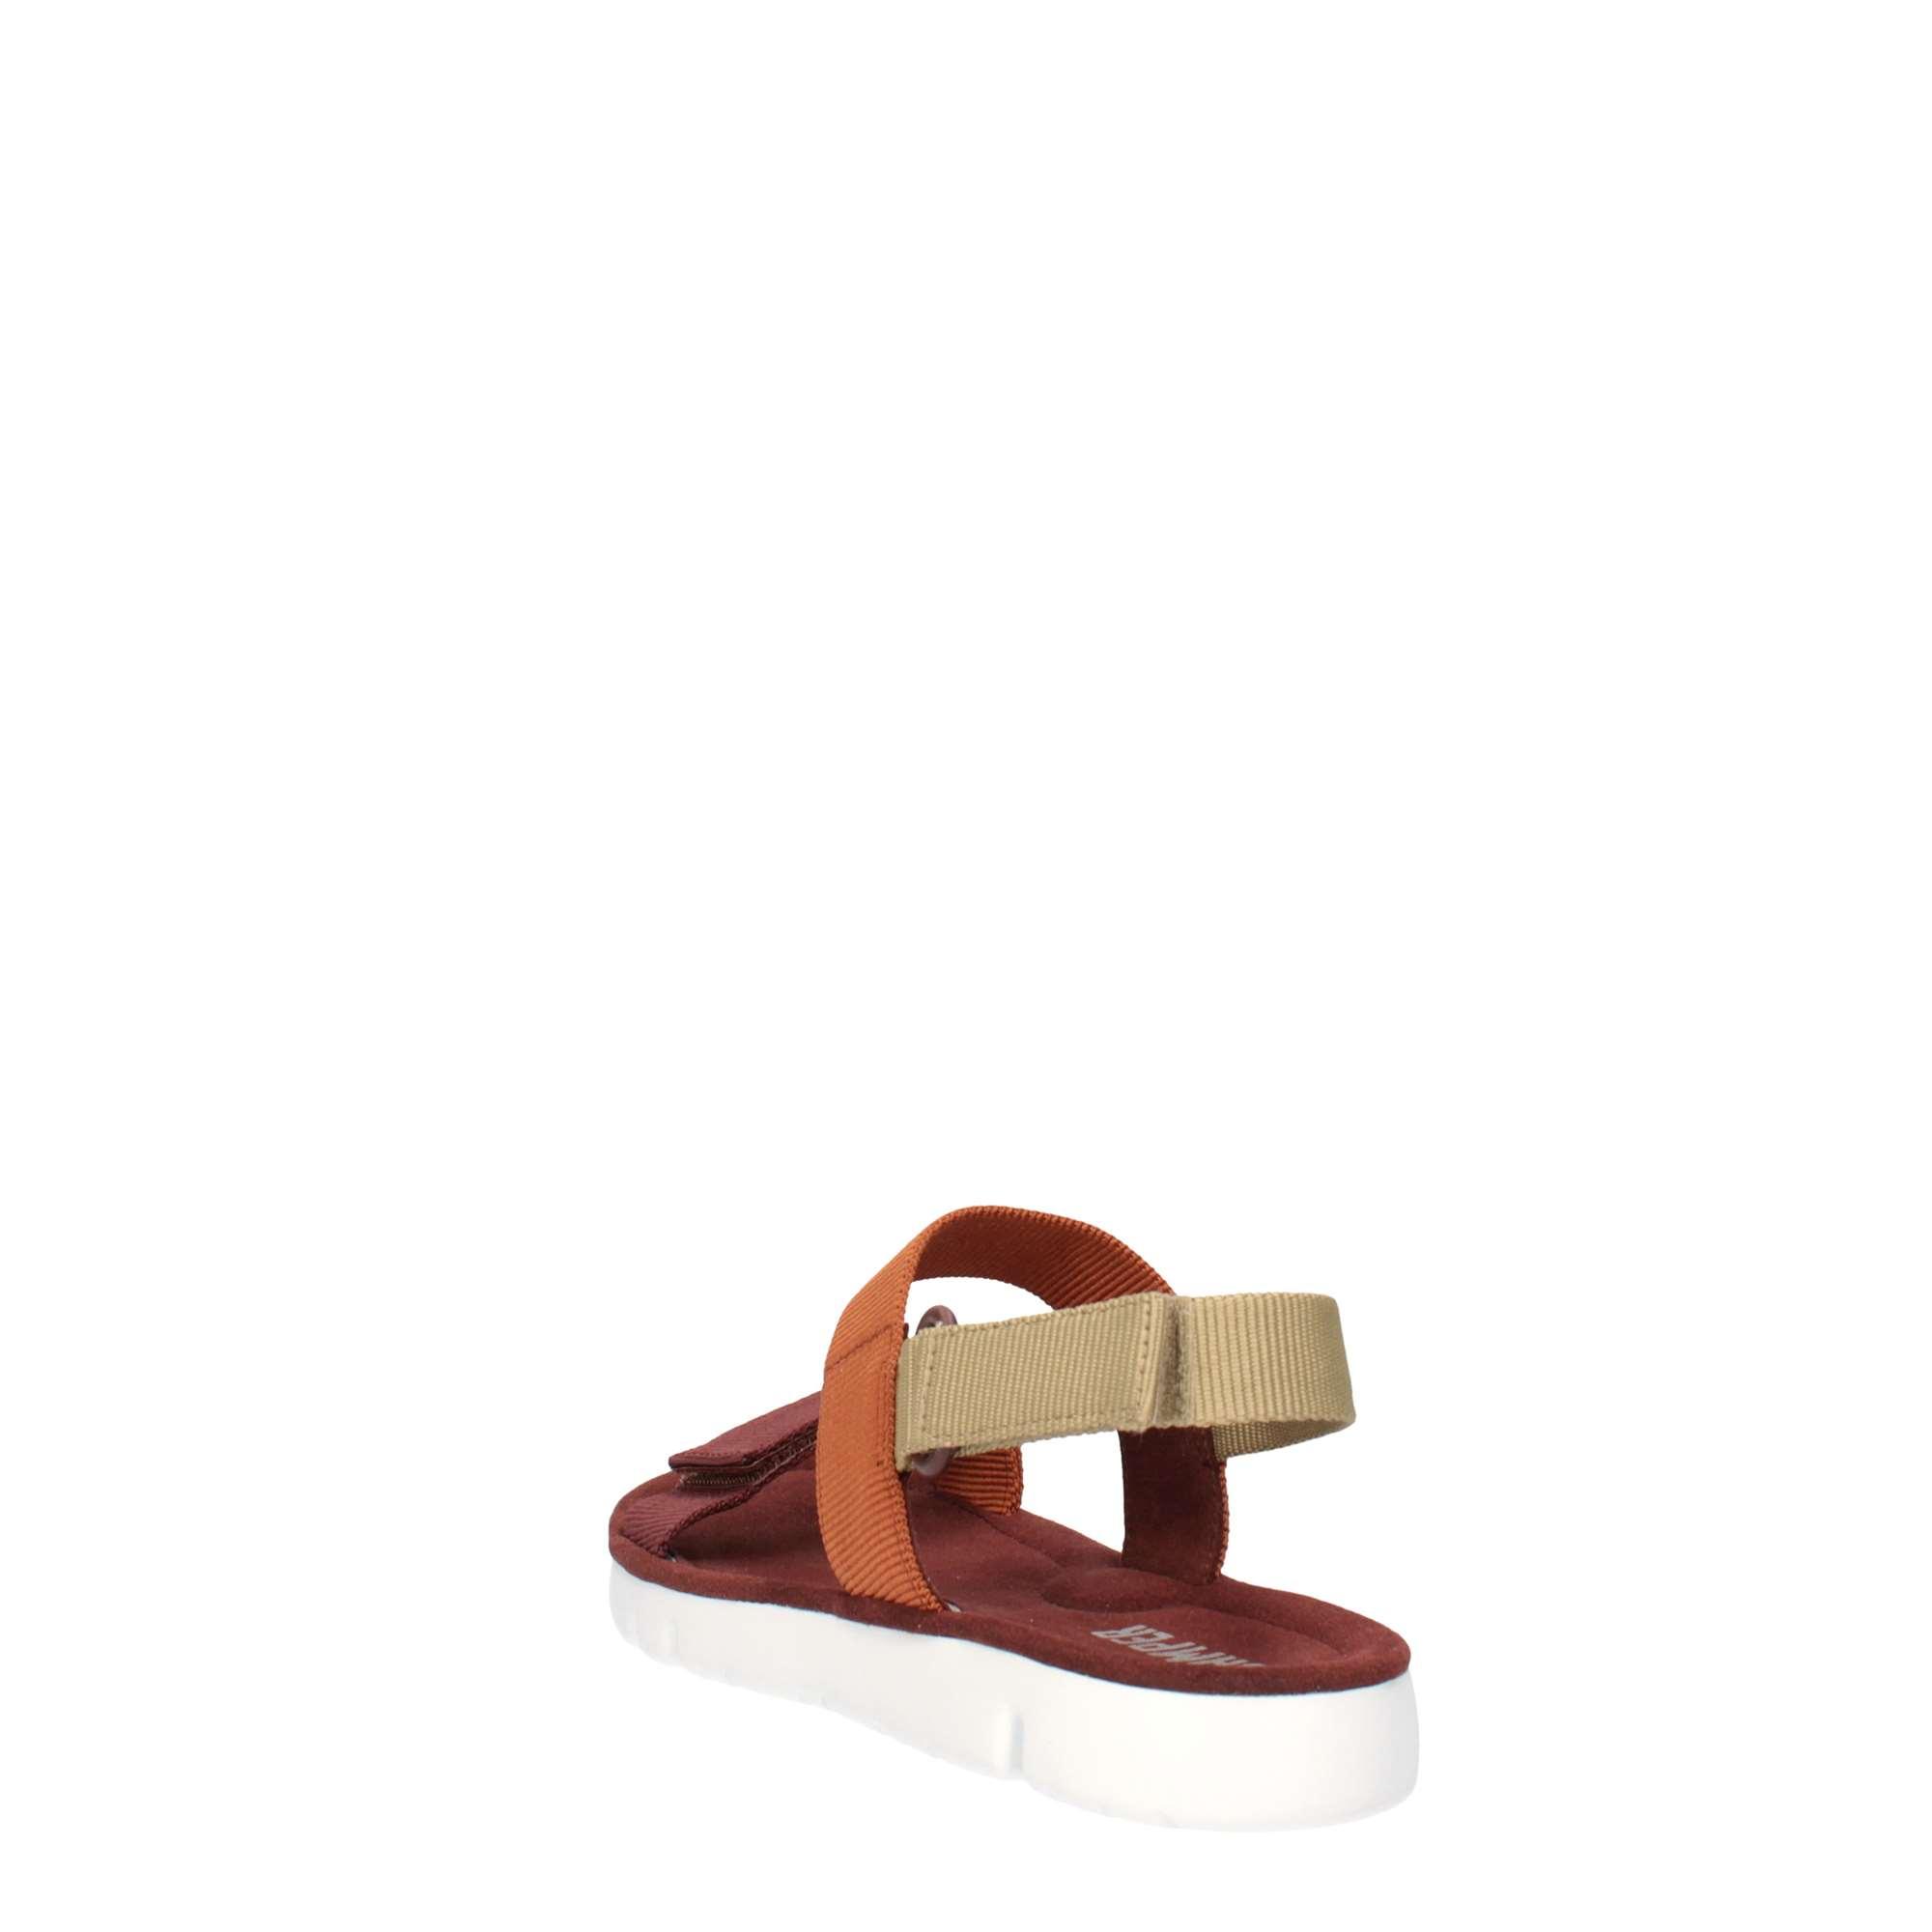 Sandalo-Donna-Camper-CASK200355-001-Primavera-Estate